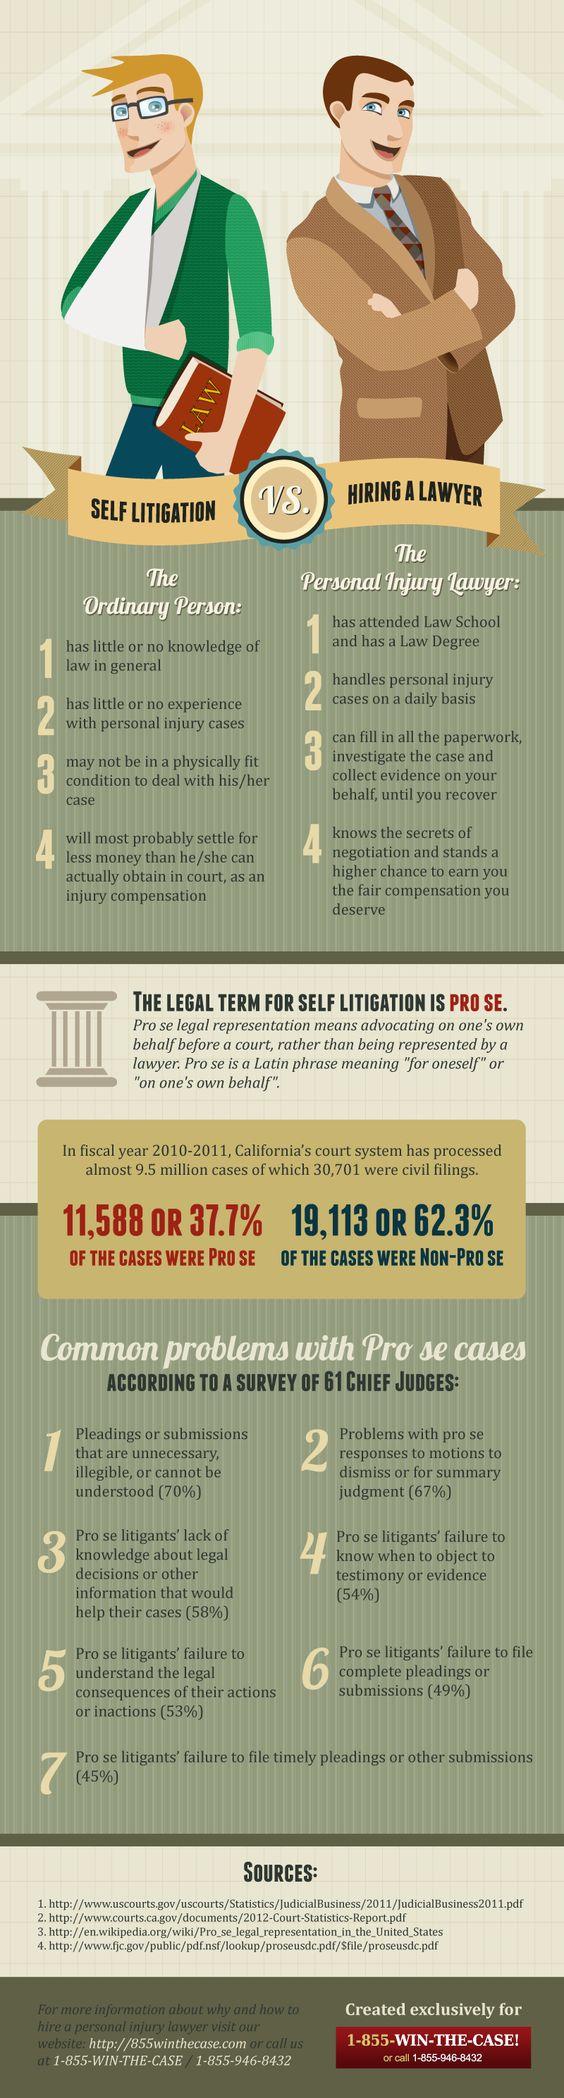 Self Litigation vs Hiring a Lawyer